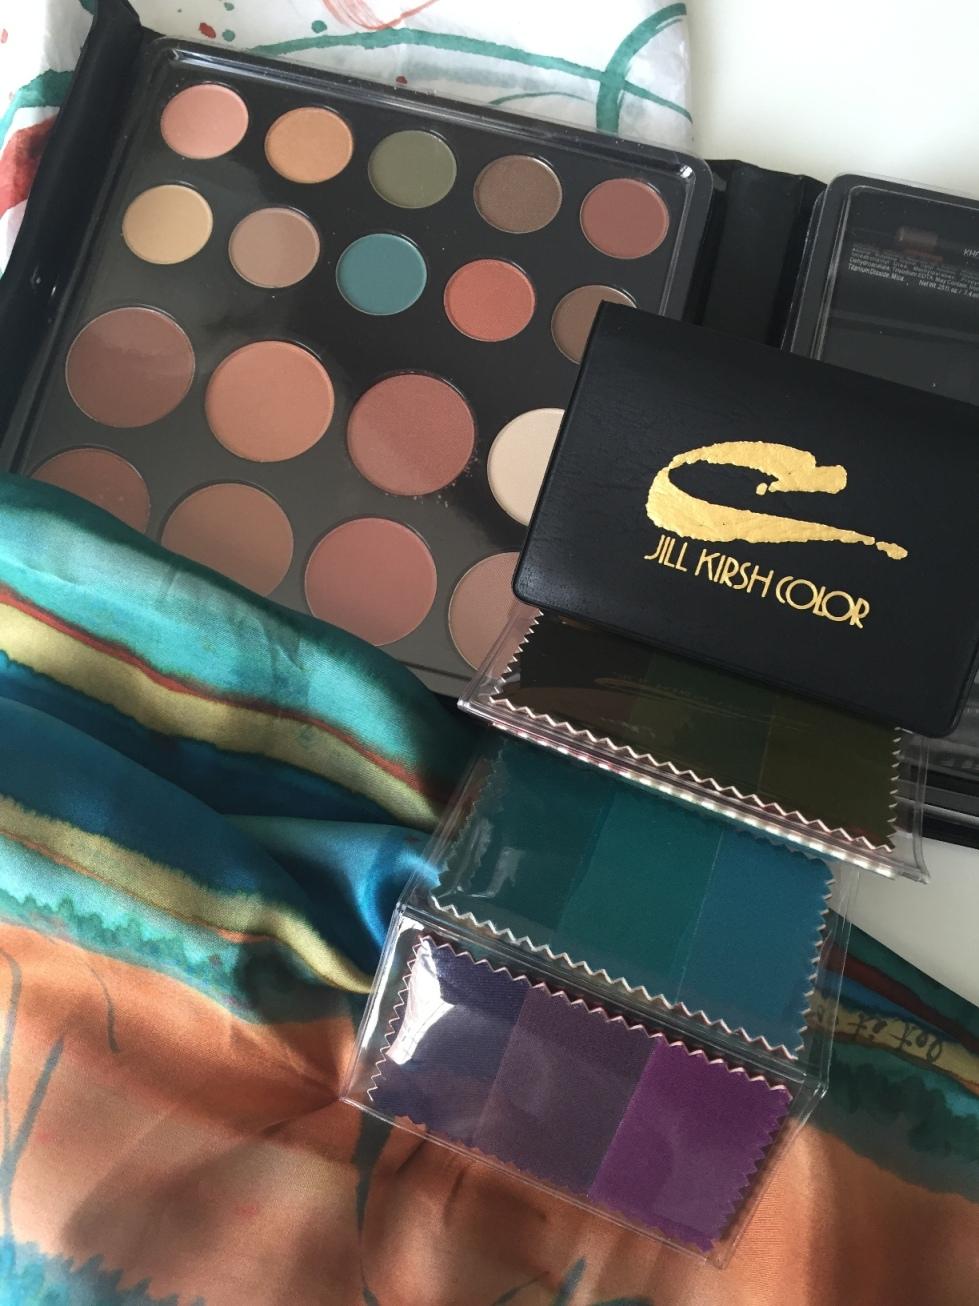 Jill Kirsh Color makeup palette and swatchbook